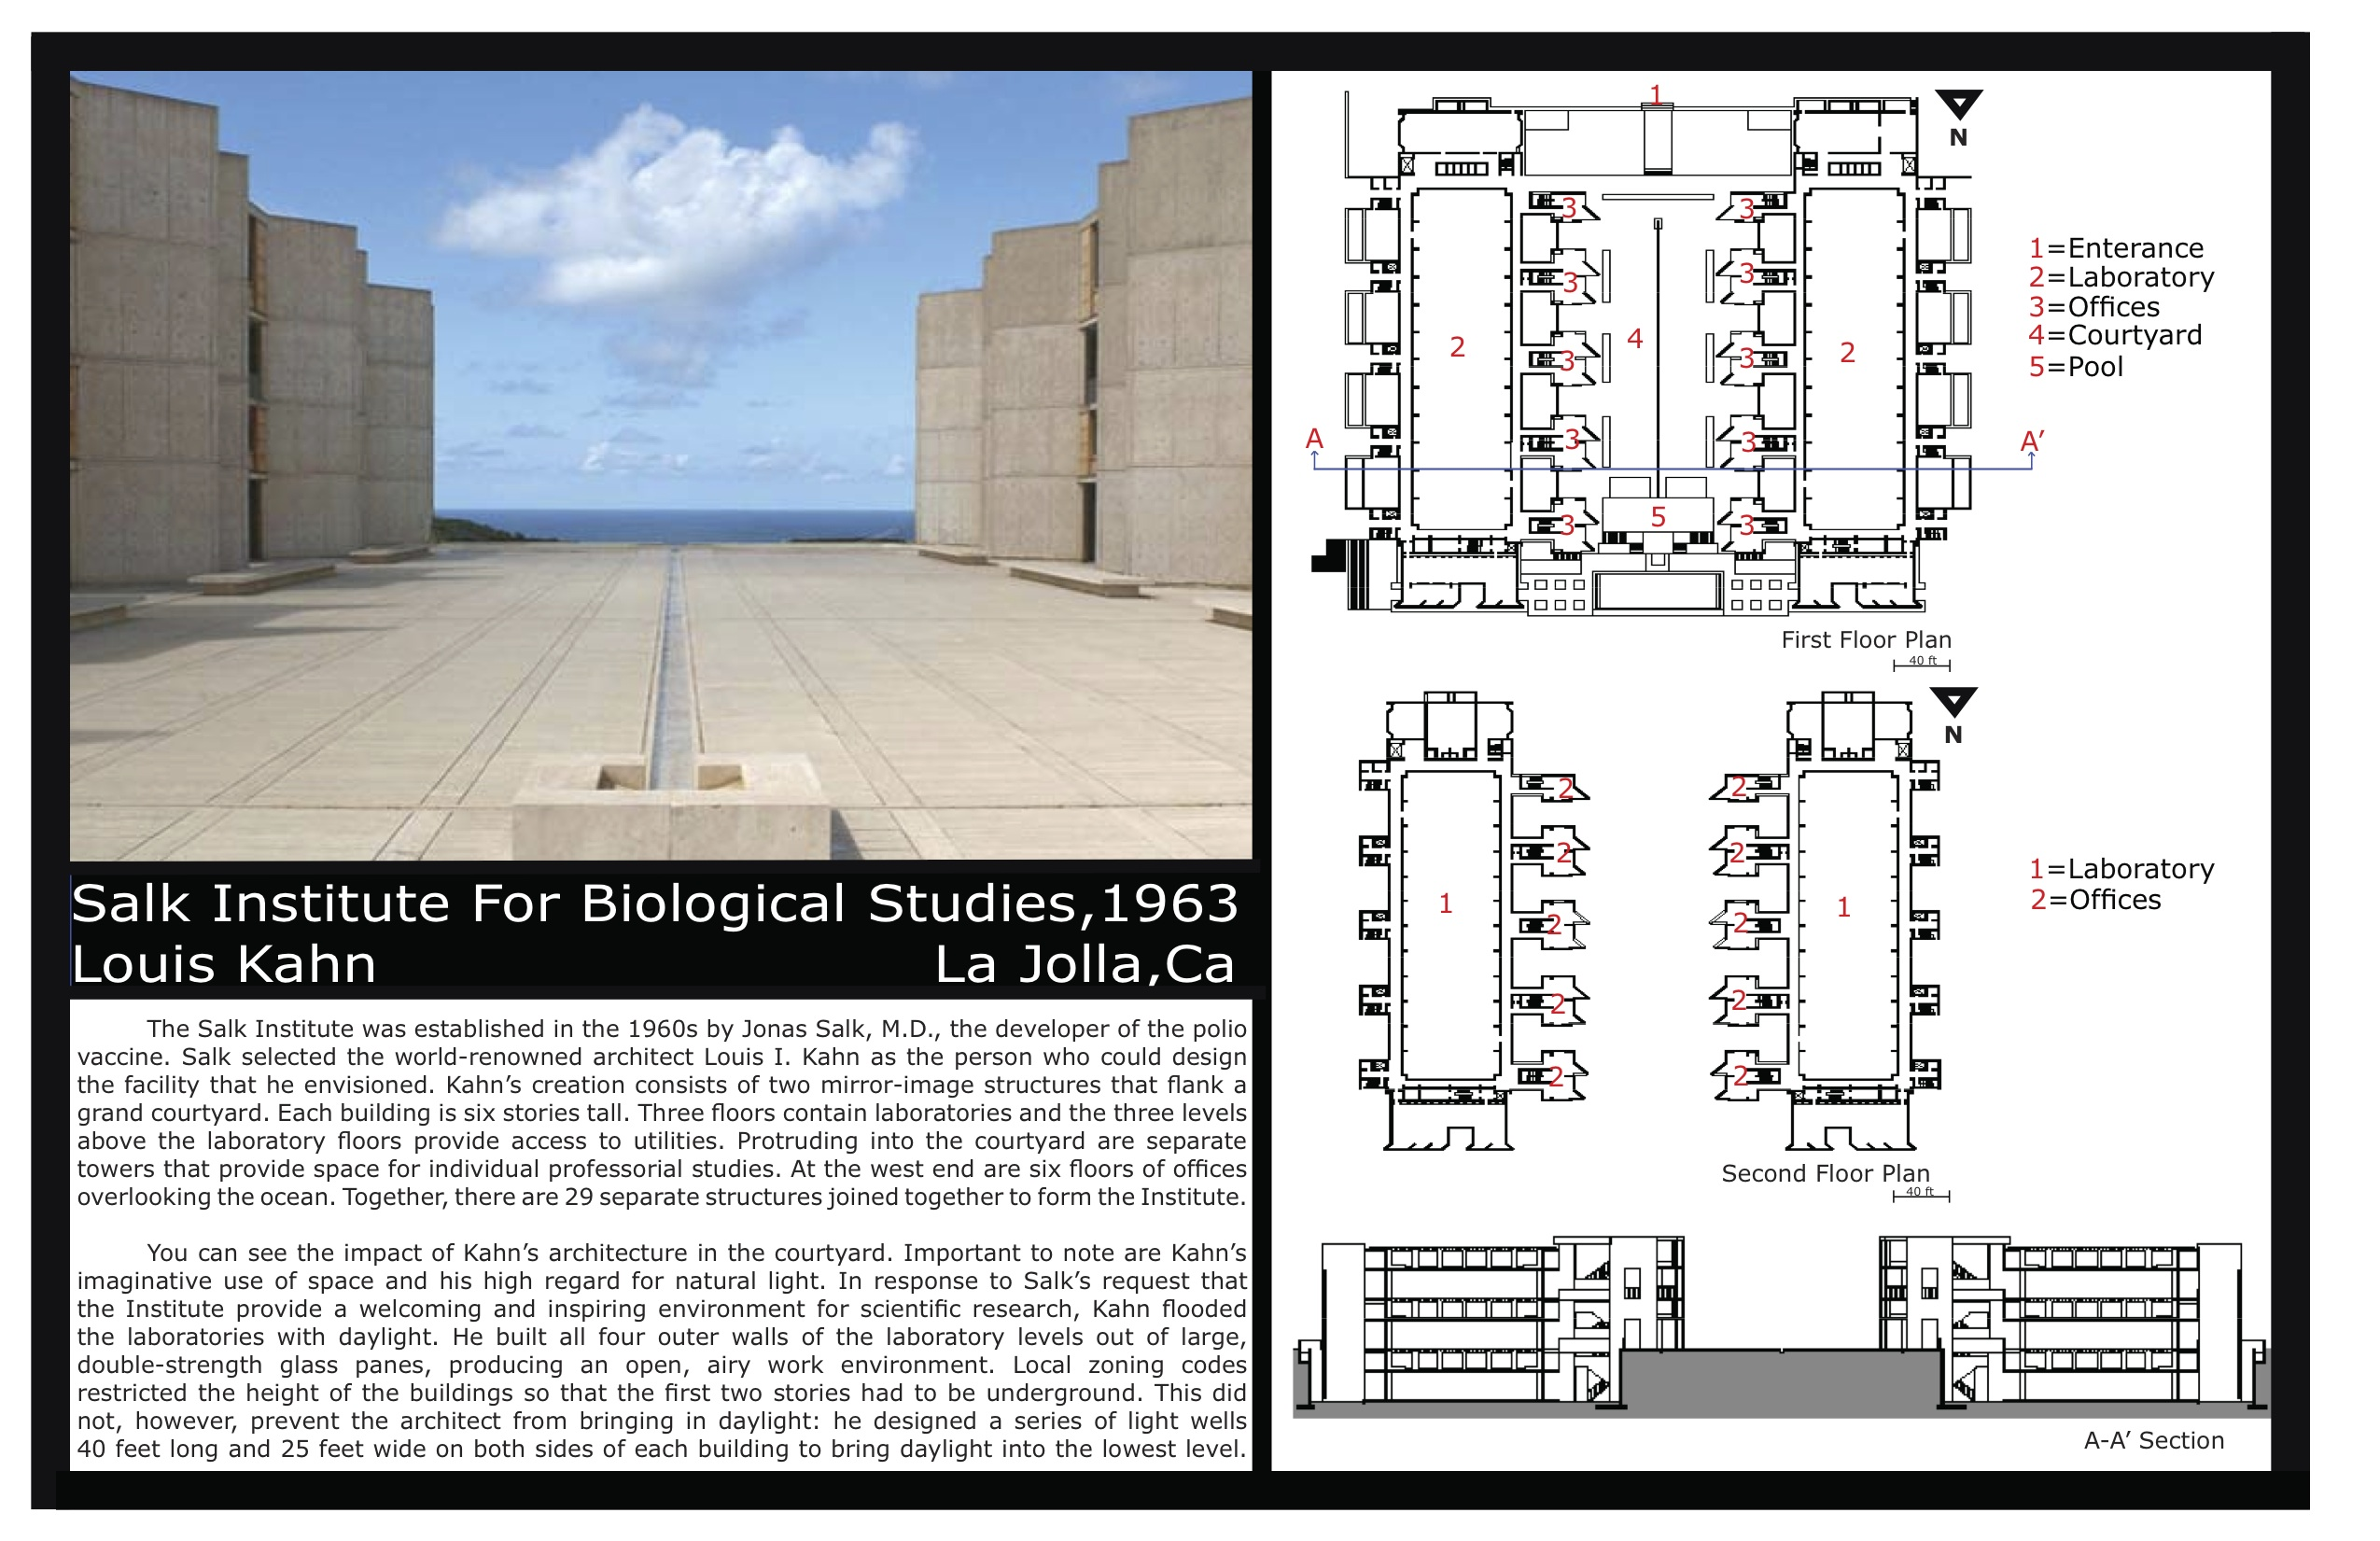 Louis Kahn Floor Plans Salk Institute Hazal Architecture 220 Dvc Sp 2012